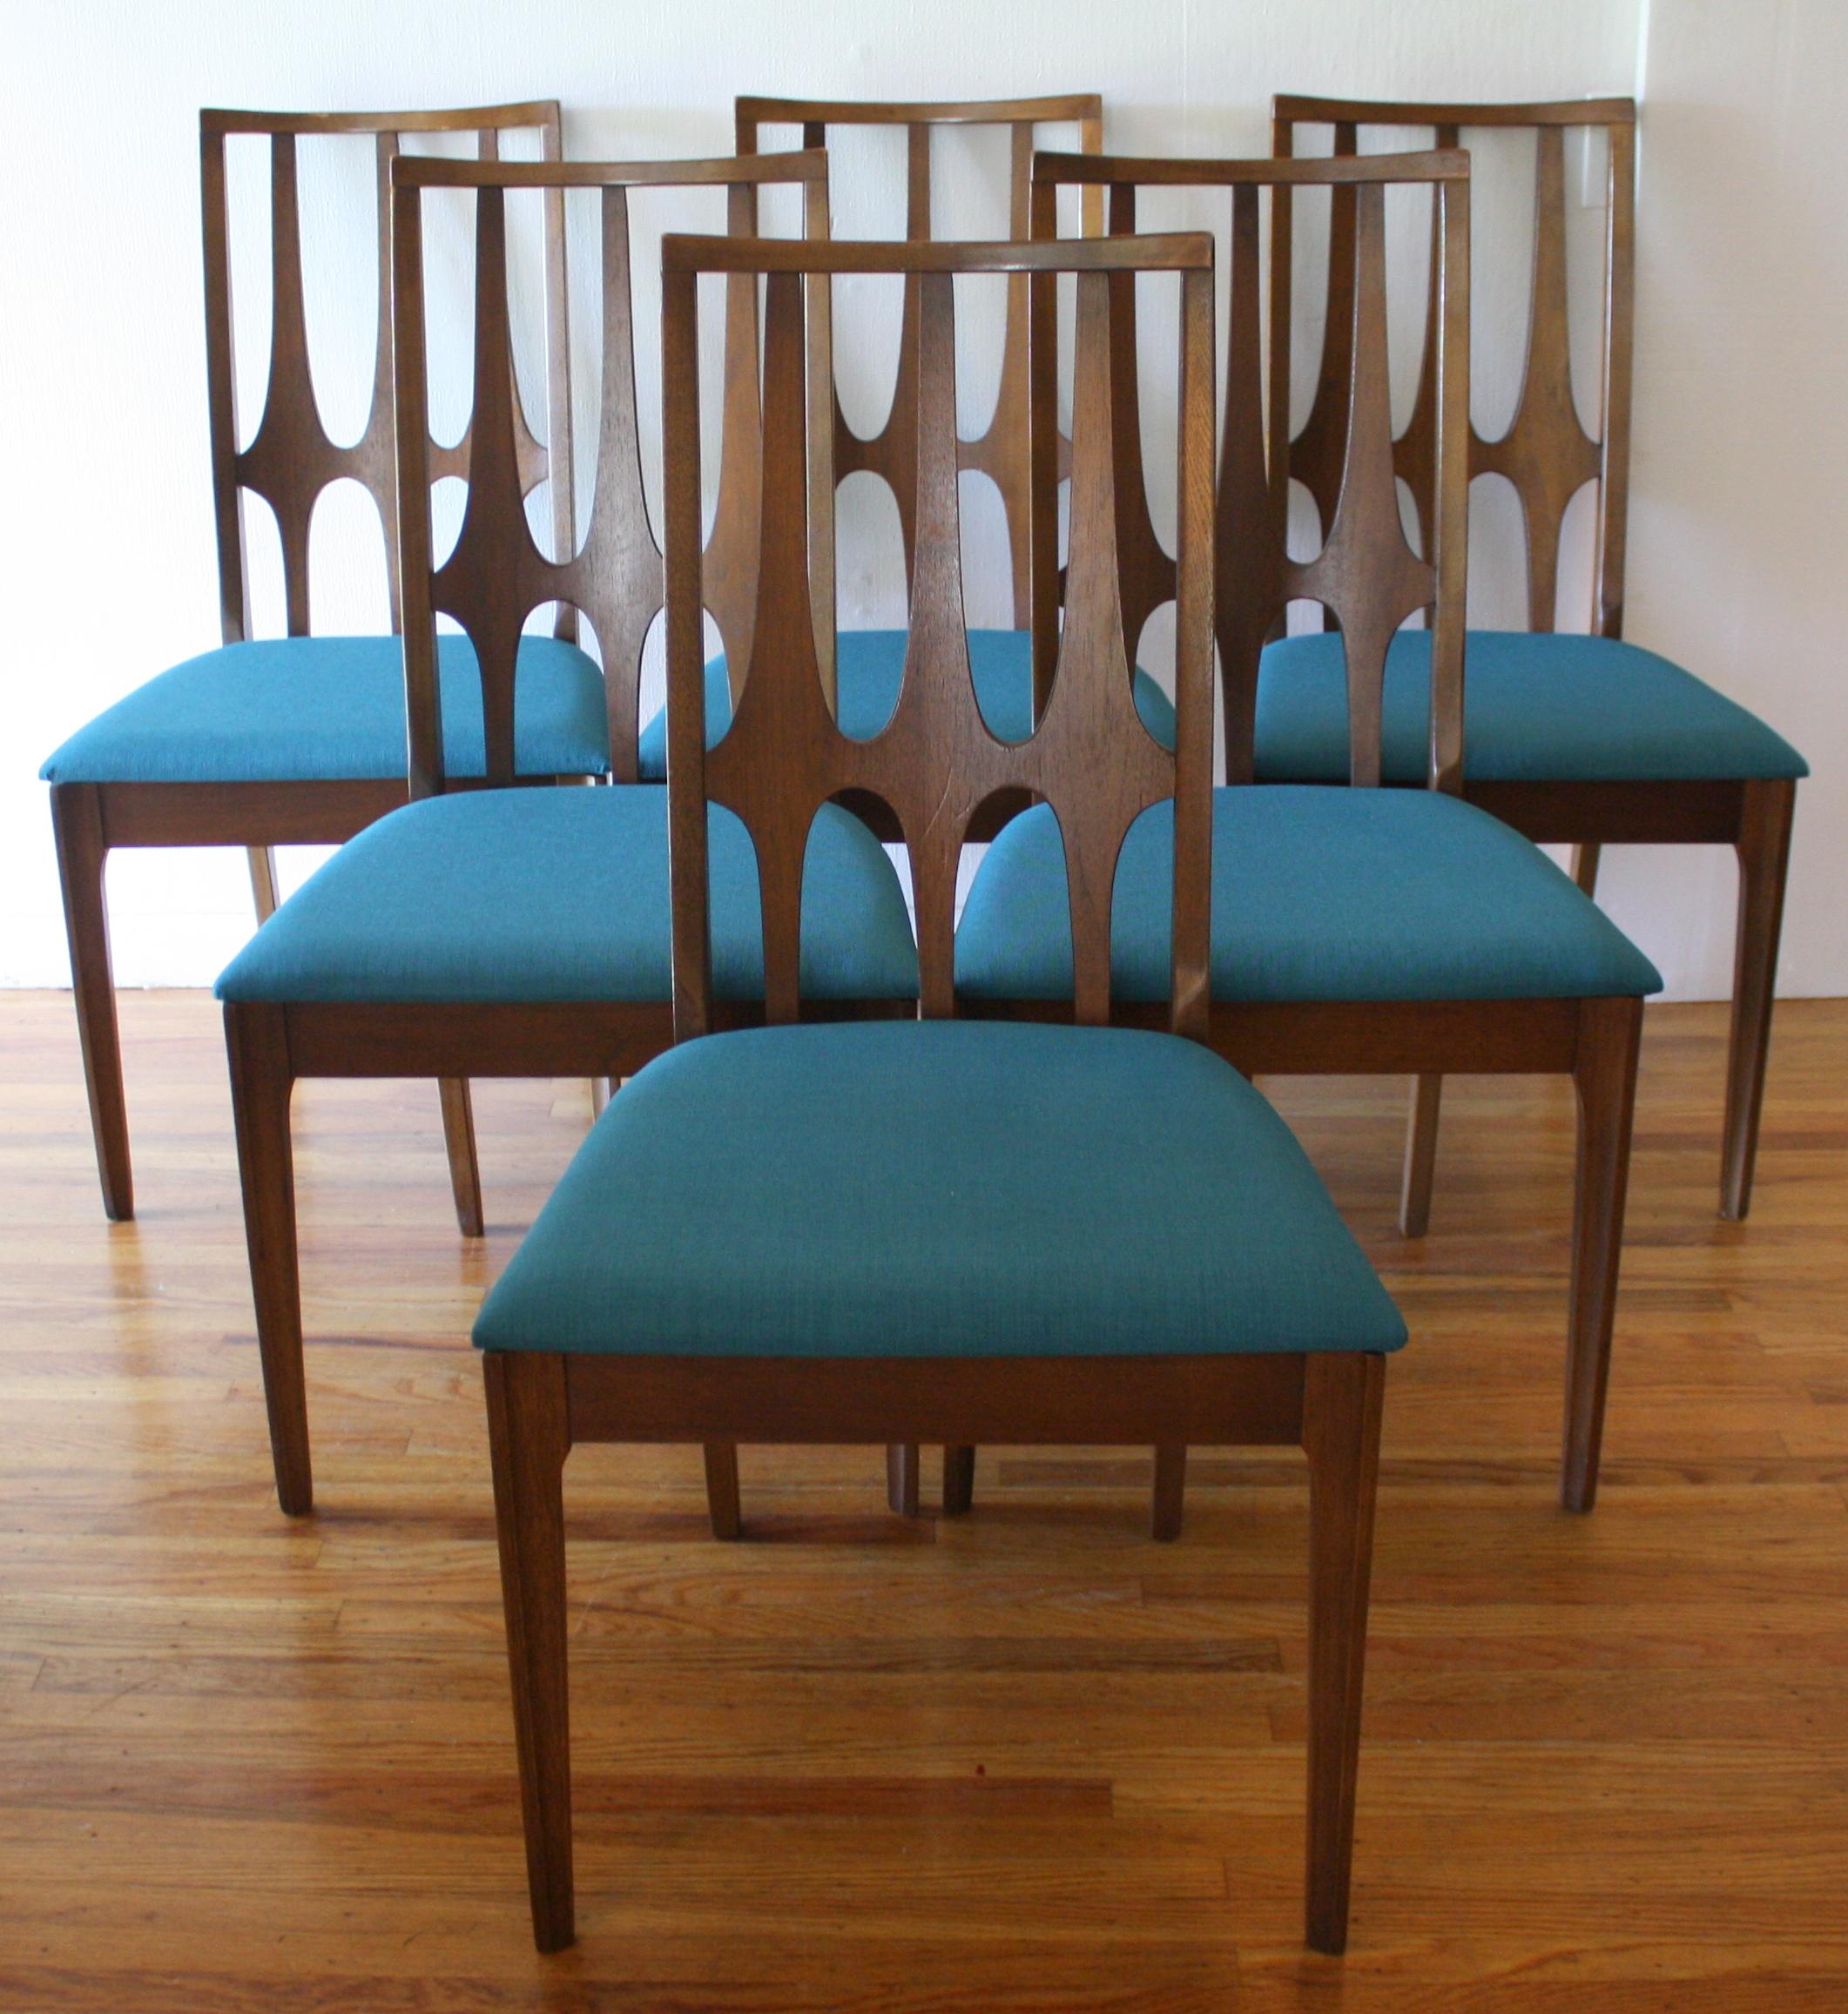 Broyhill Brasilia dining chairs 1.JPG